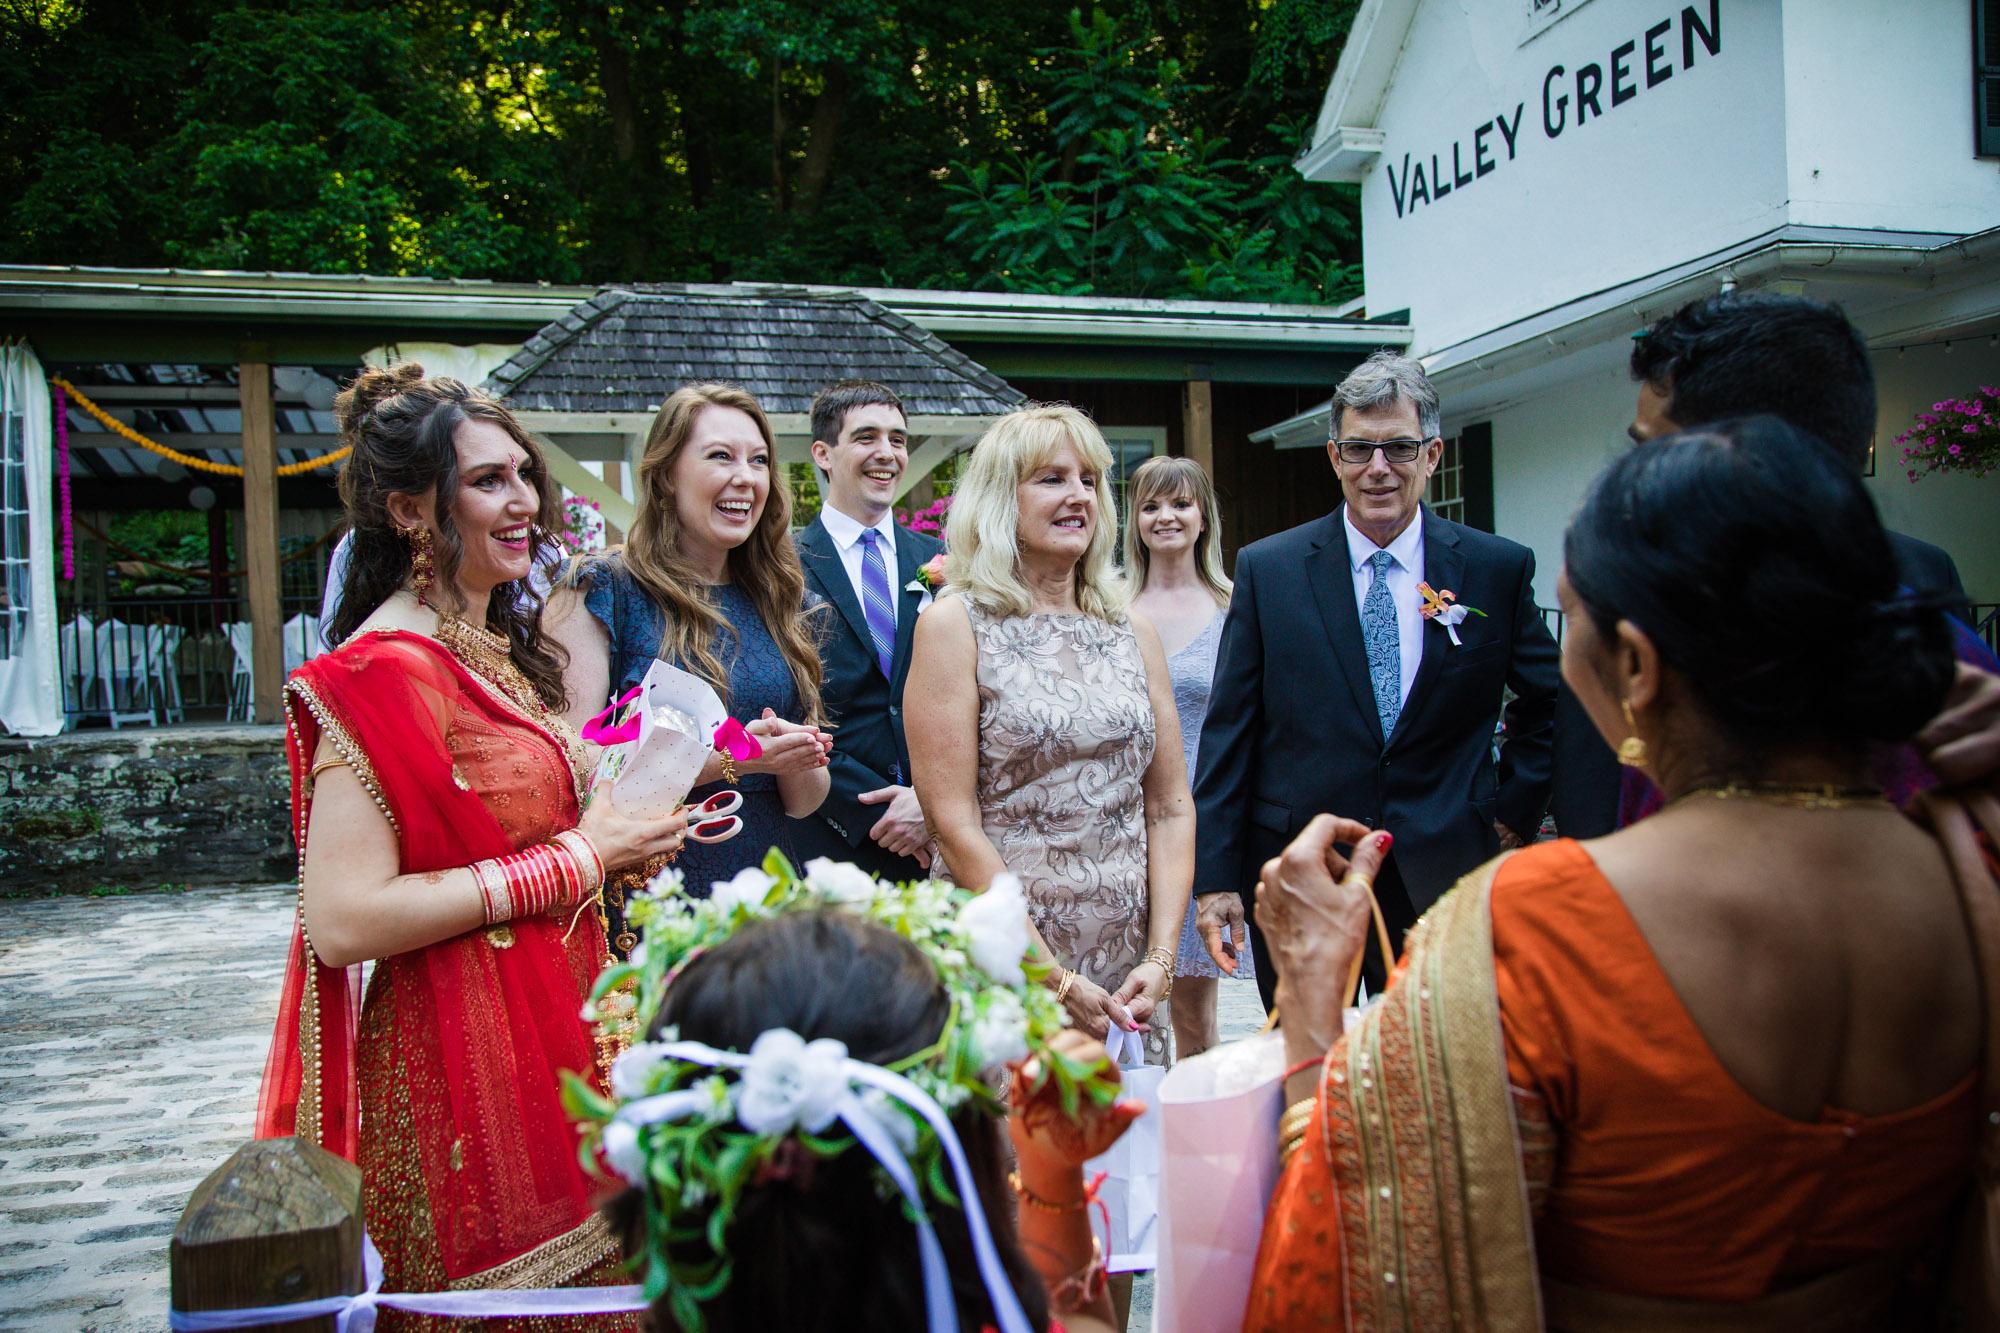 VALLEY GREEN INN WEDDING PHOTOS - 021.jpg